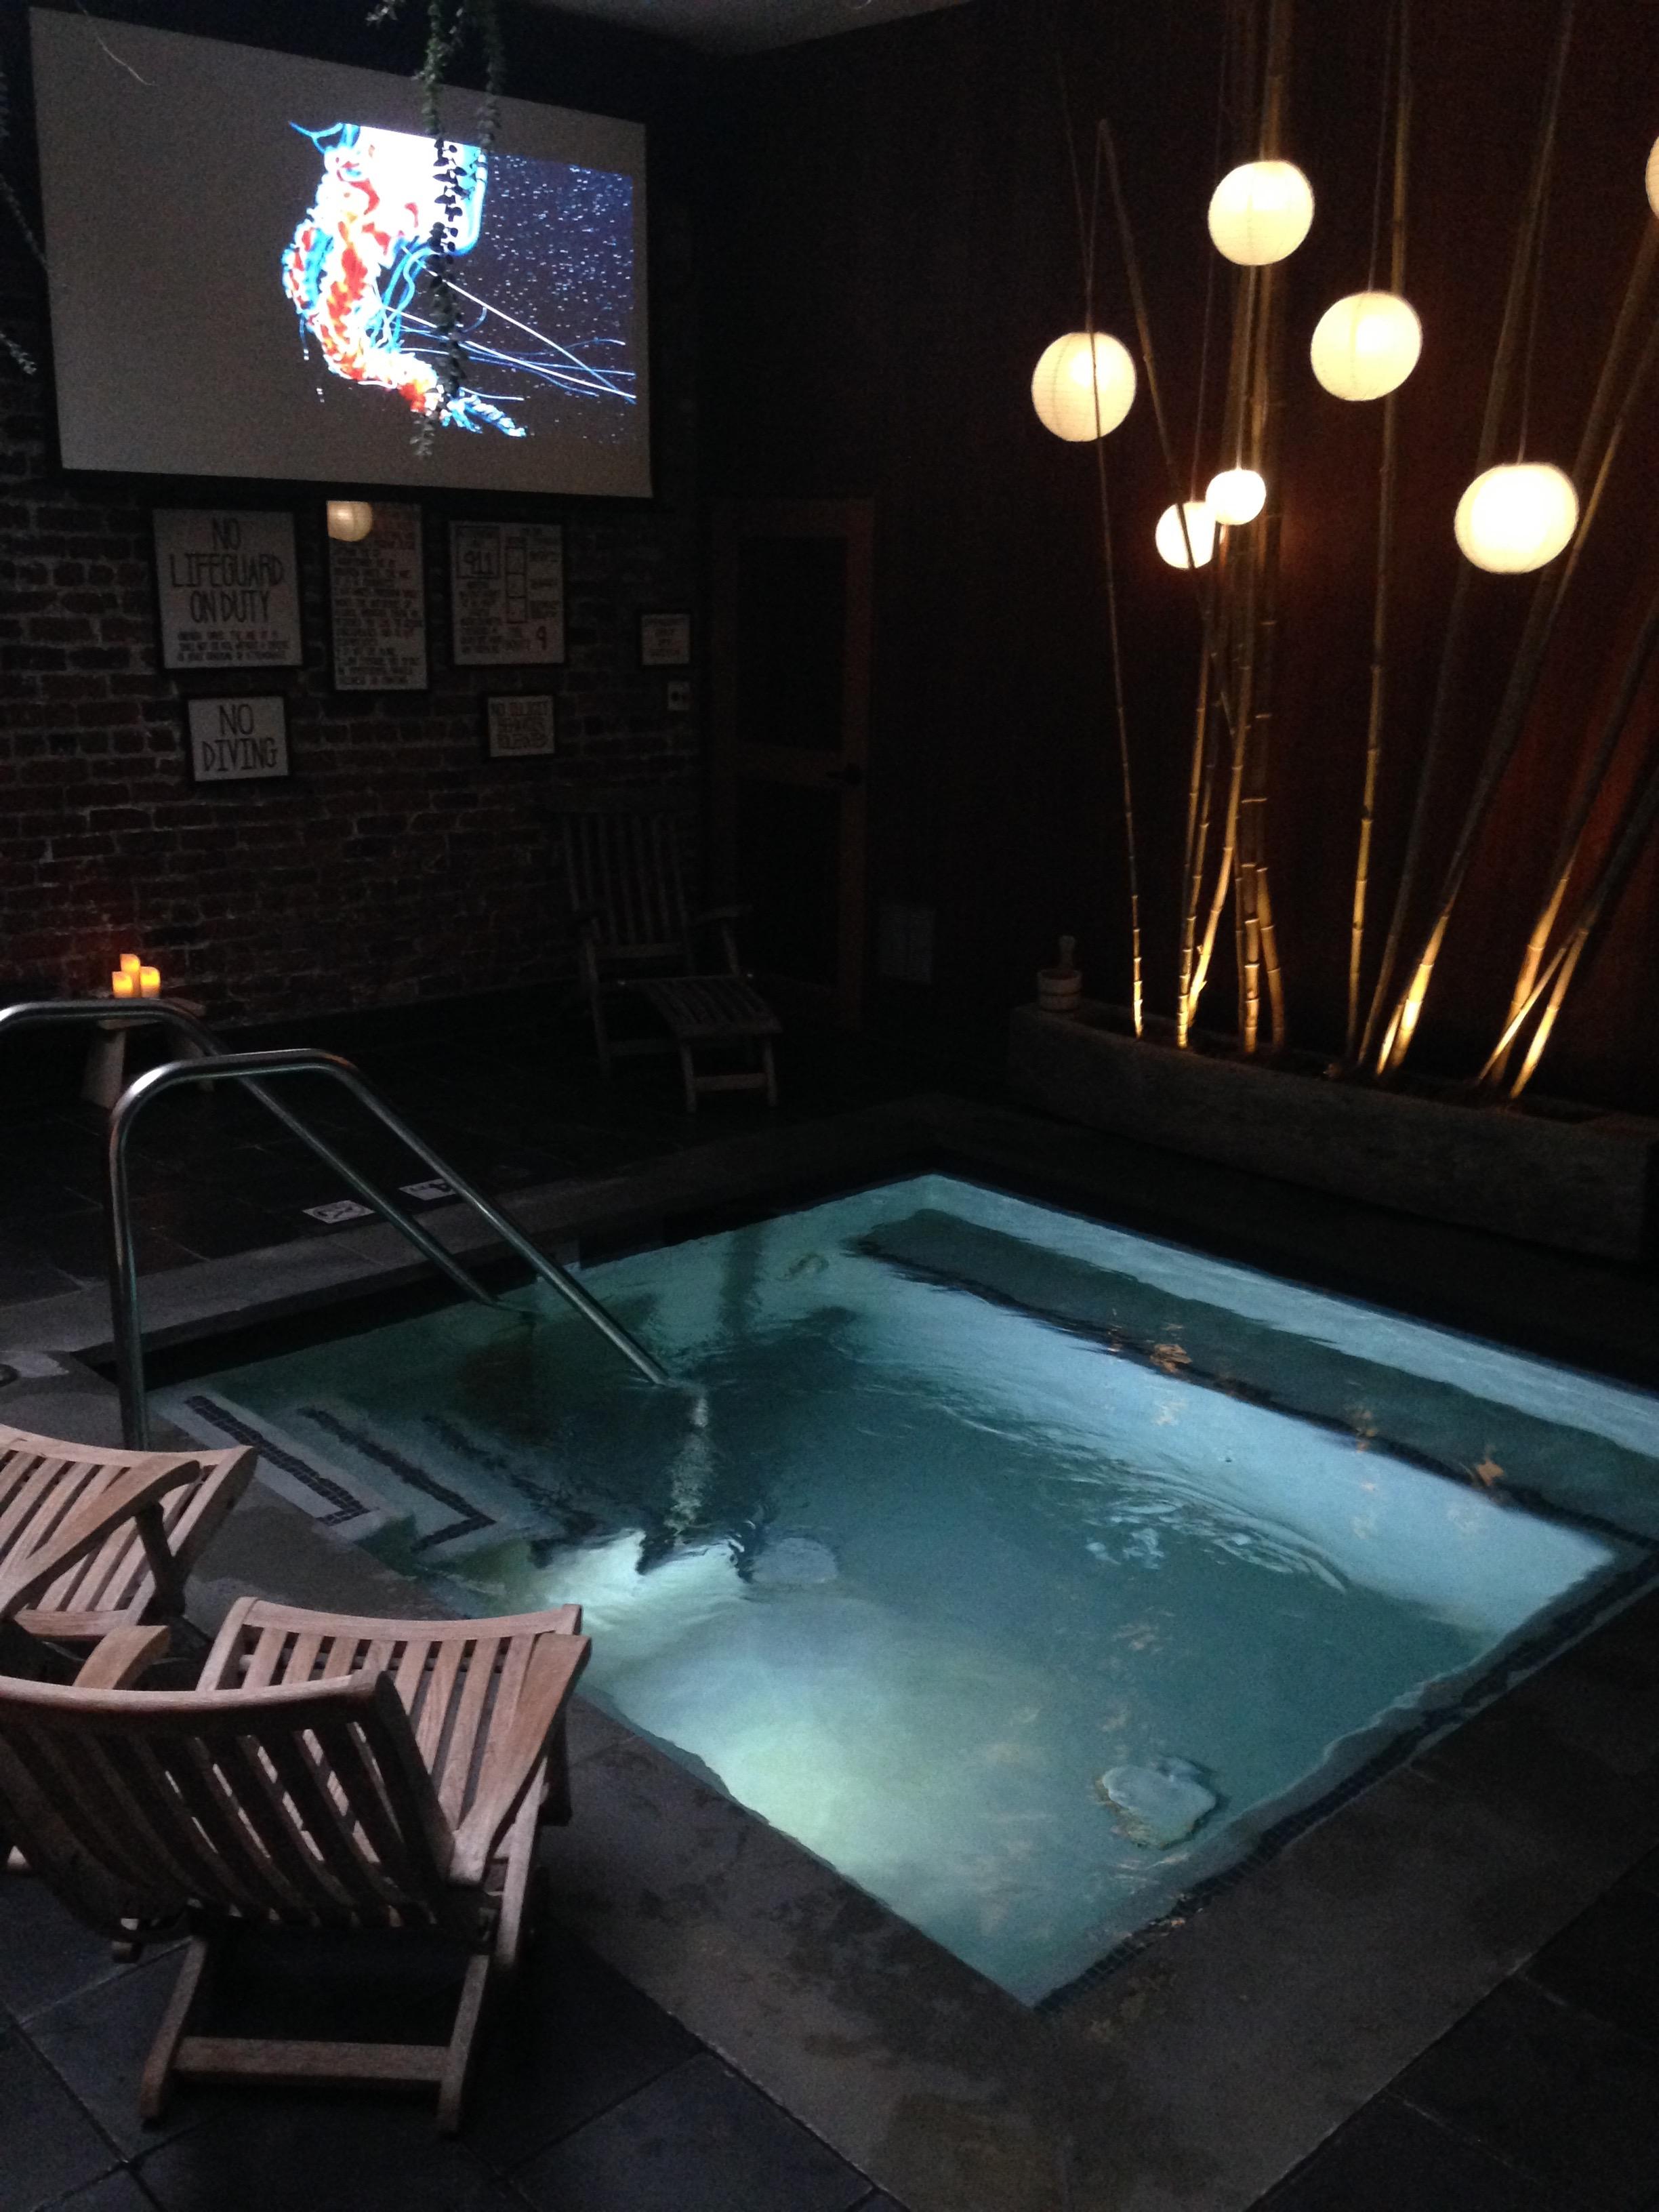 Movie Night at Onsen communal bathhouse